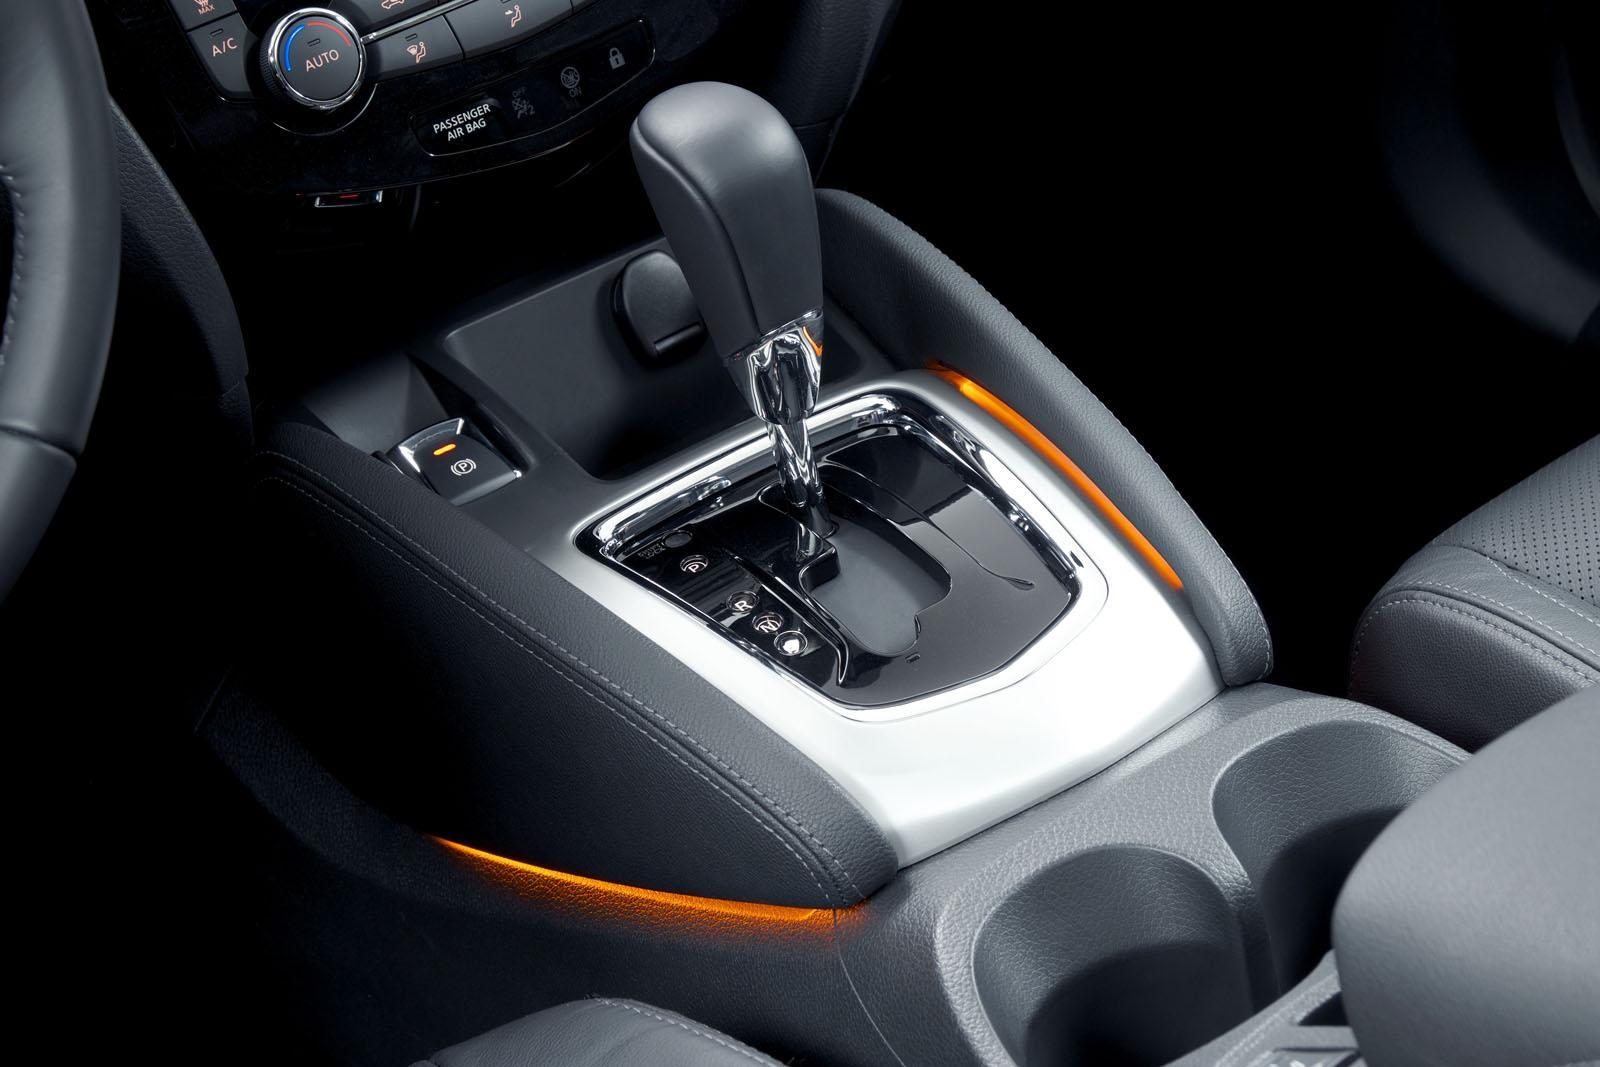 2014 Nissan Qashqai automatic gear lever - ForceGT.com